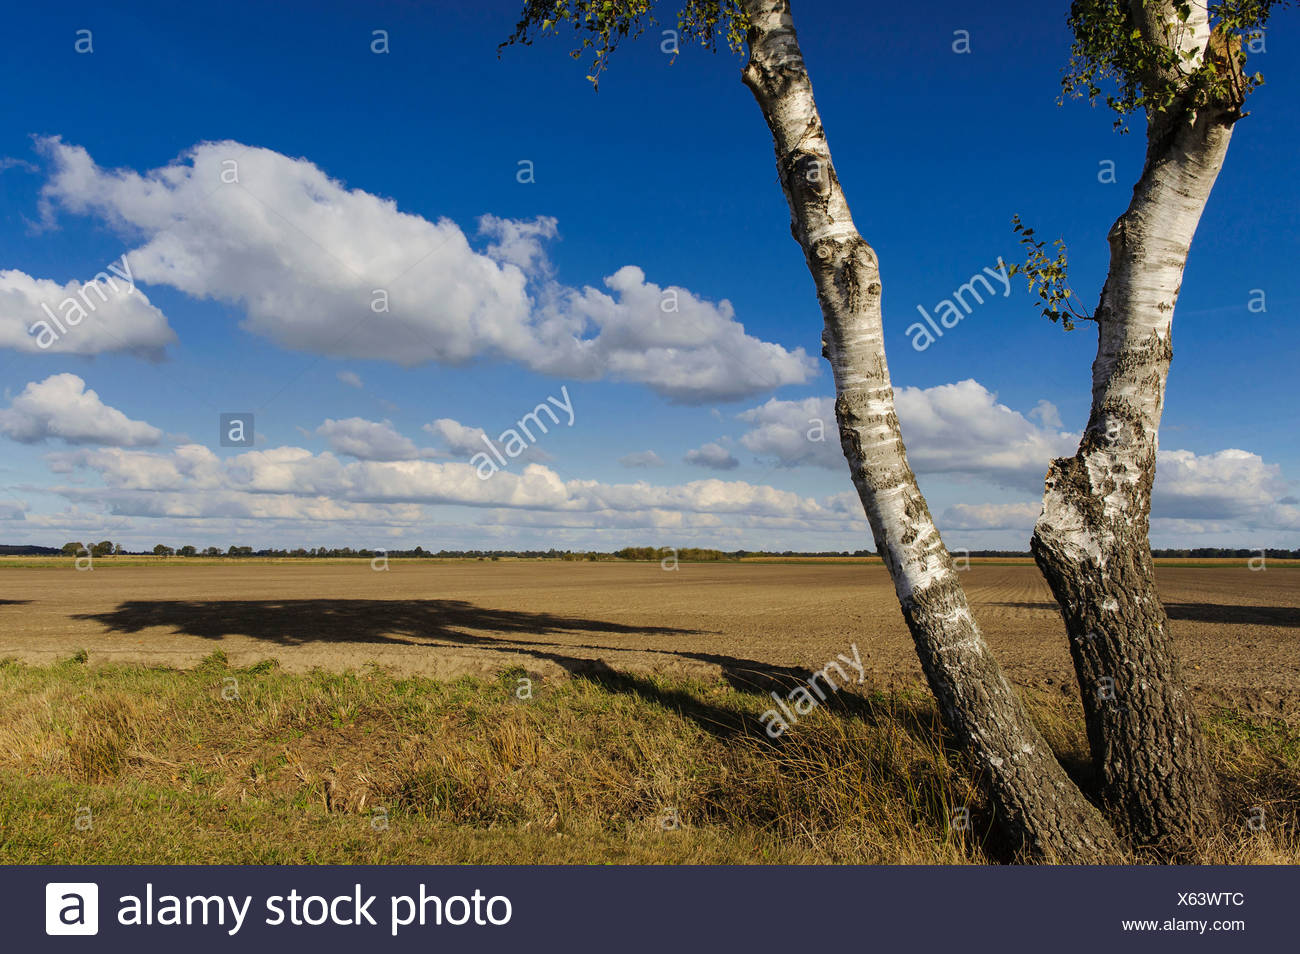 birch trees in marshland, diepholzer moorniederung, diepholz district, niedersachsen, germany - Stock Image